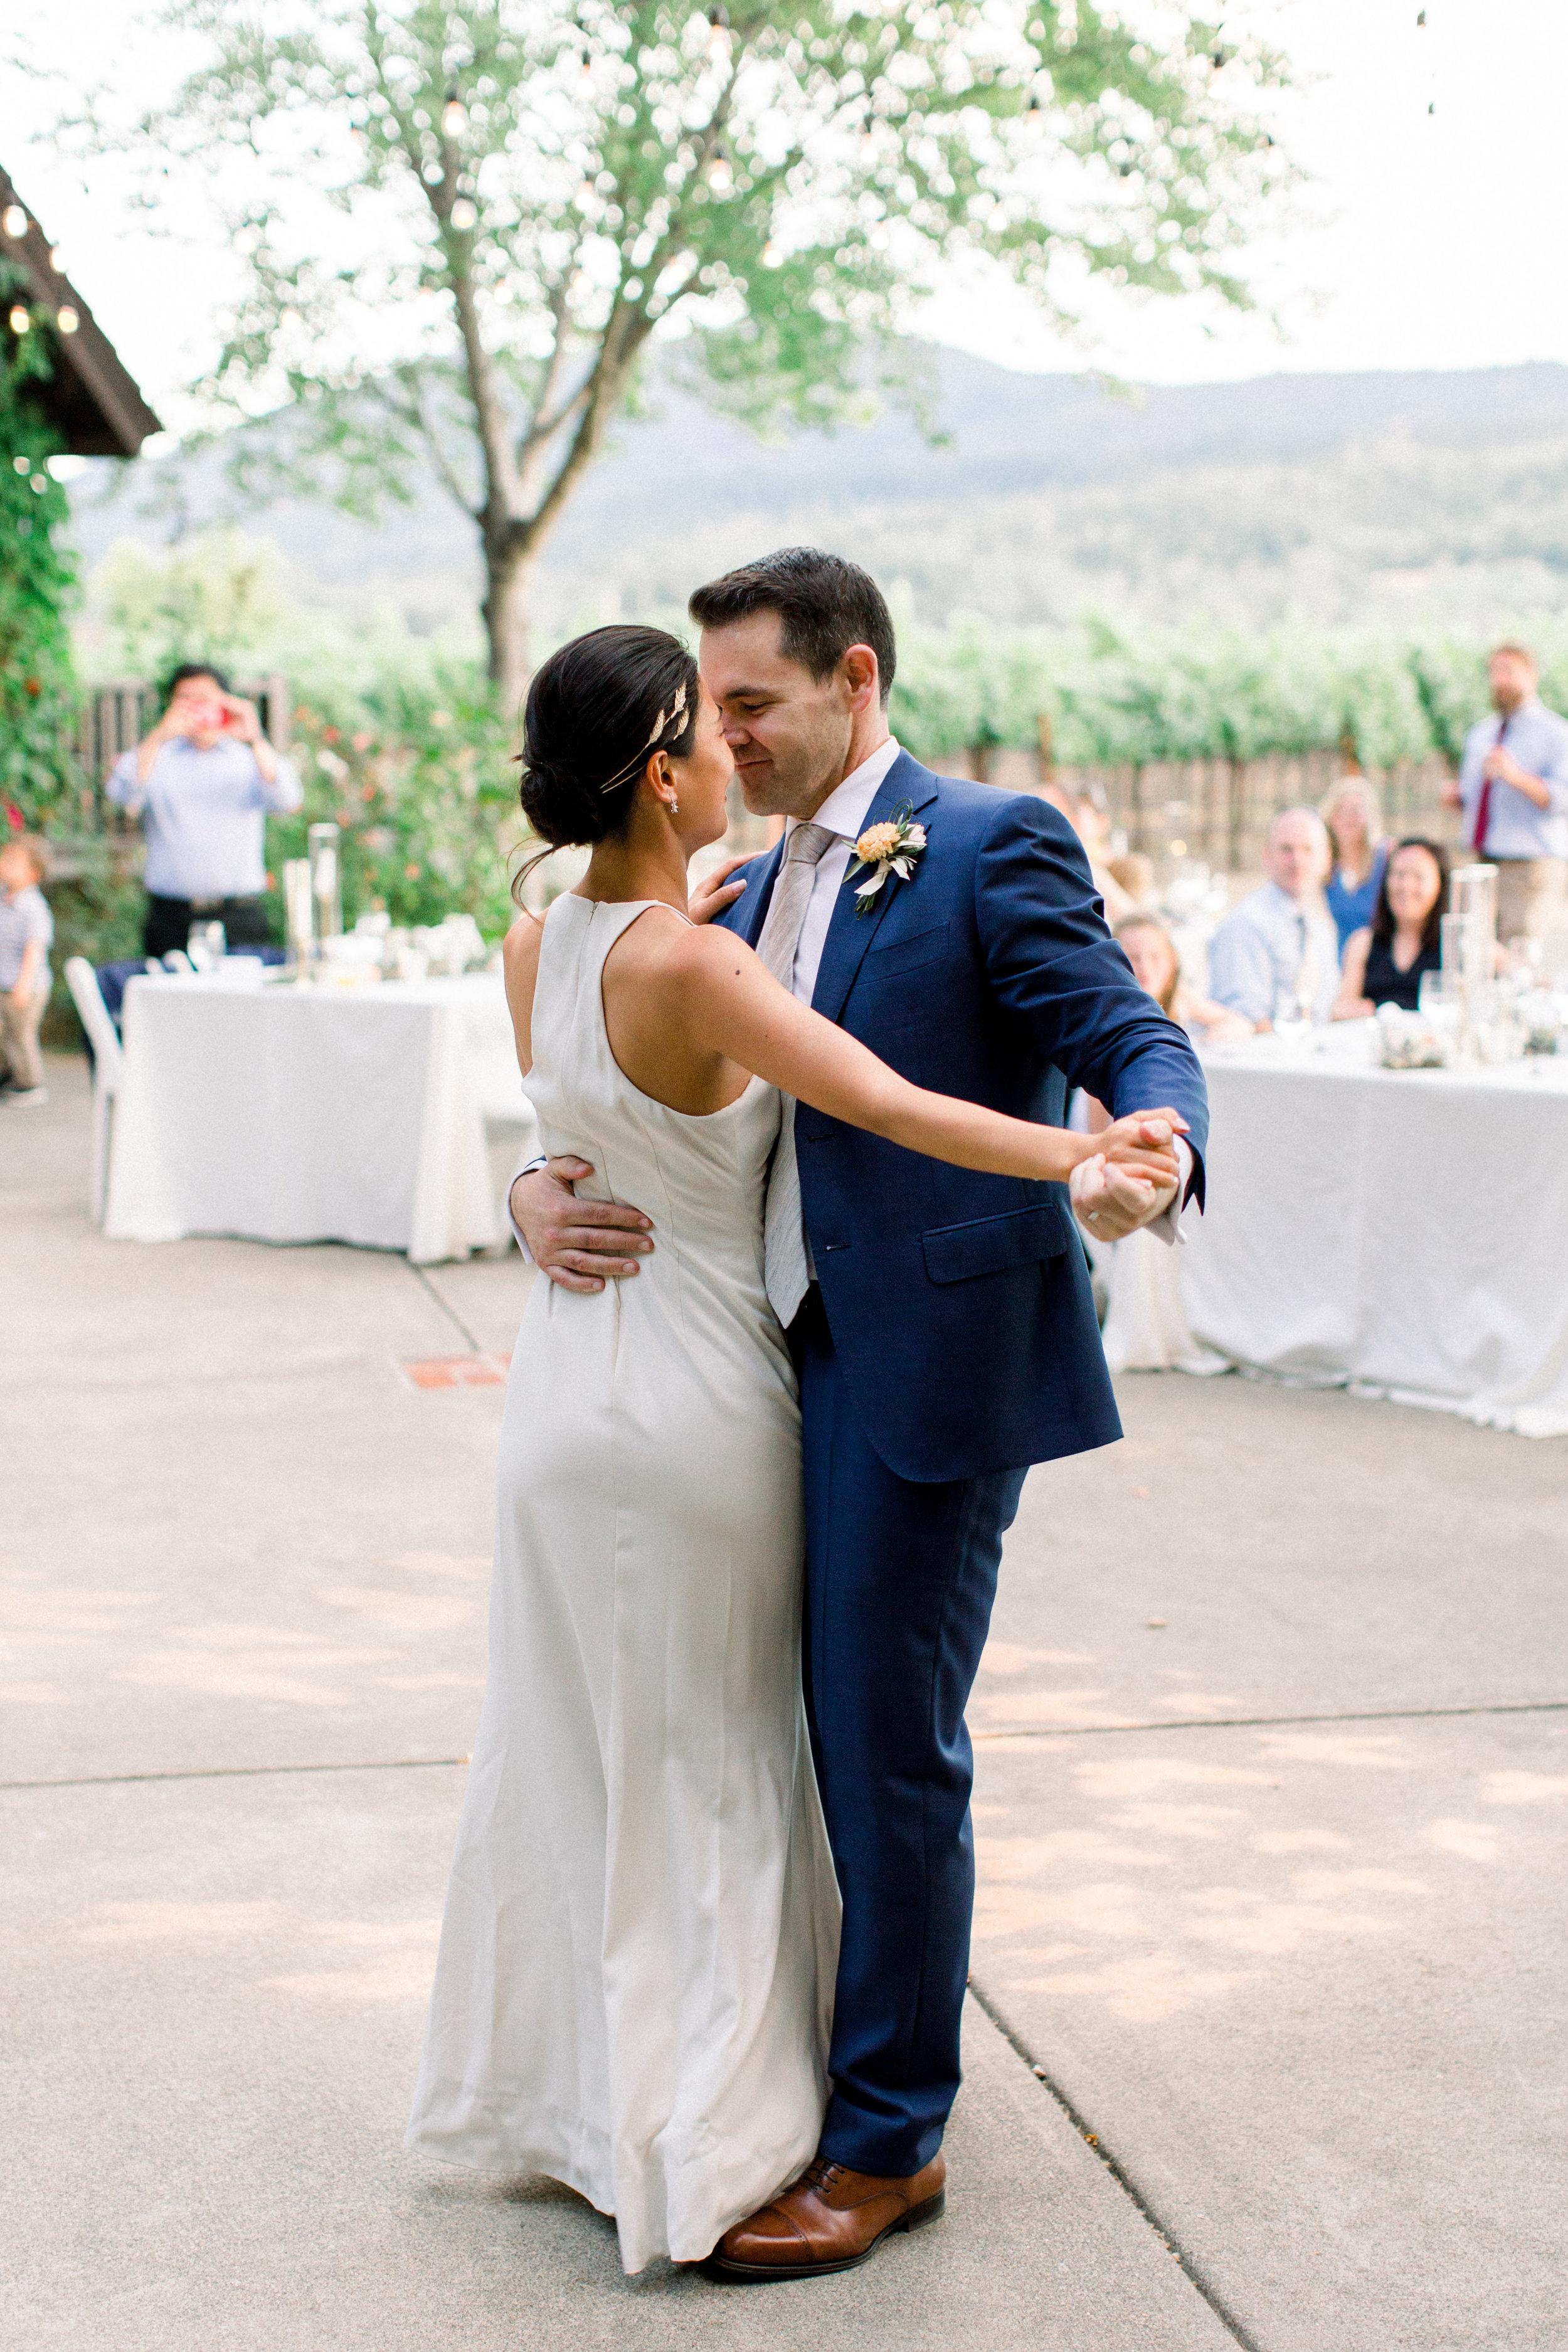 Harvest-inn-wedding-in-napa-california-332.jpg